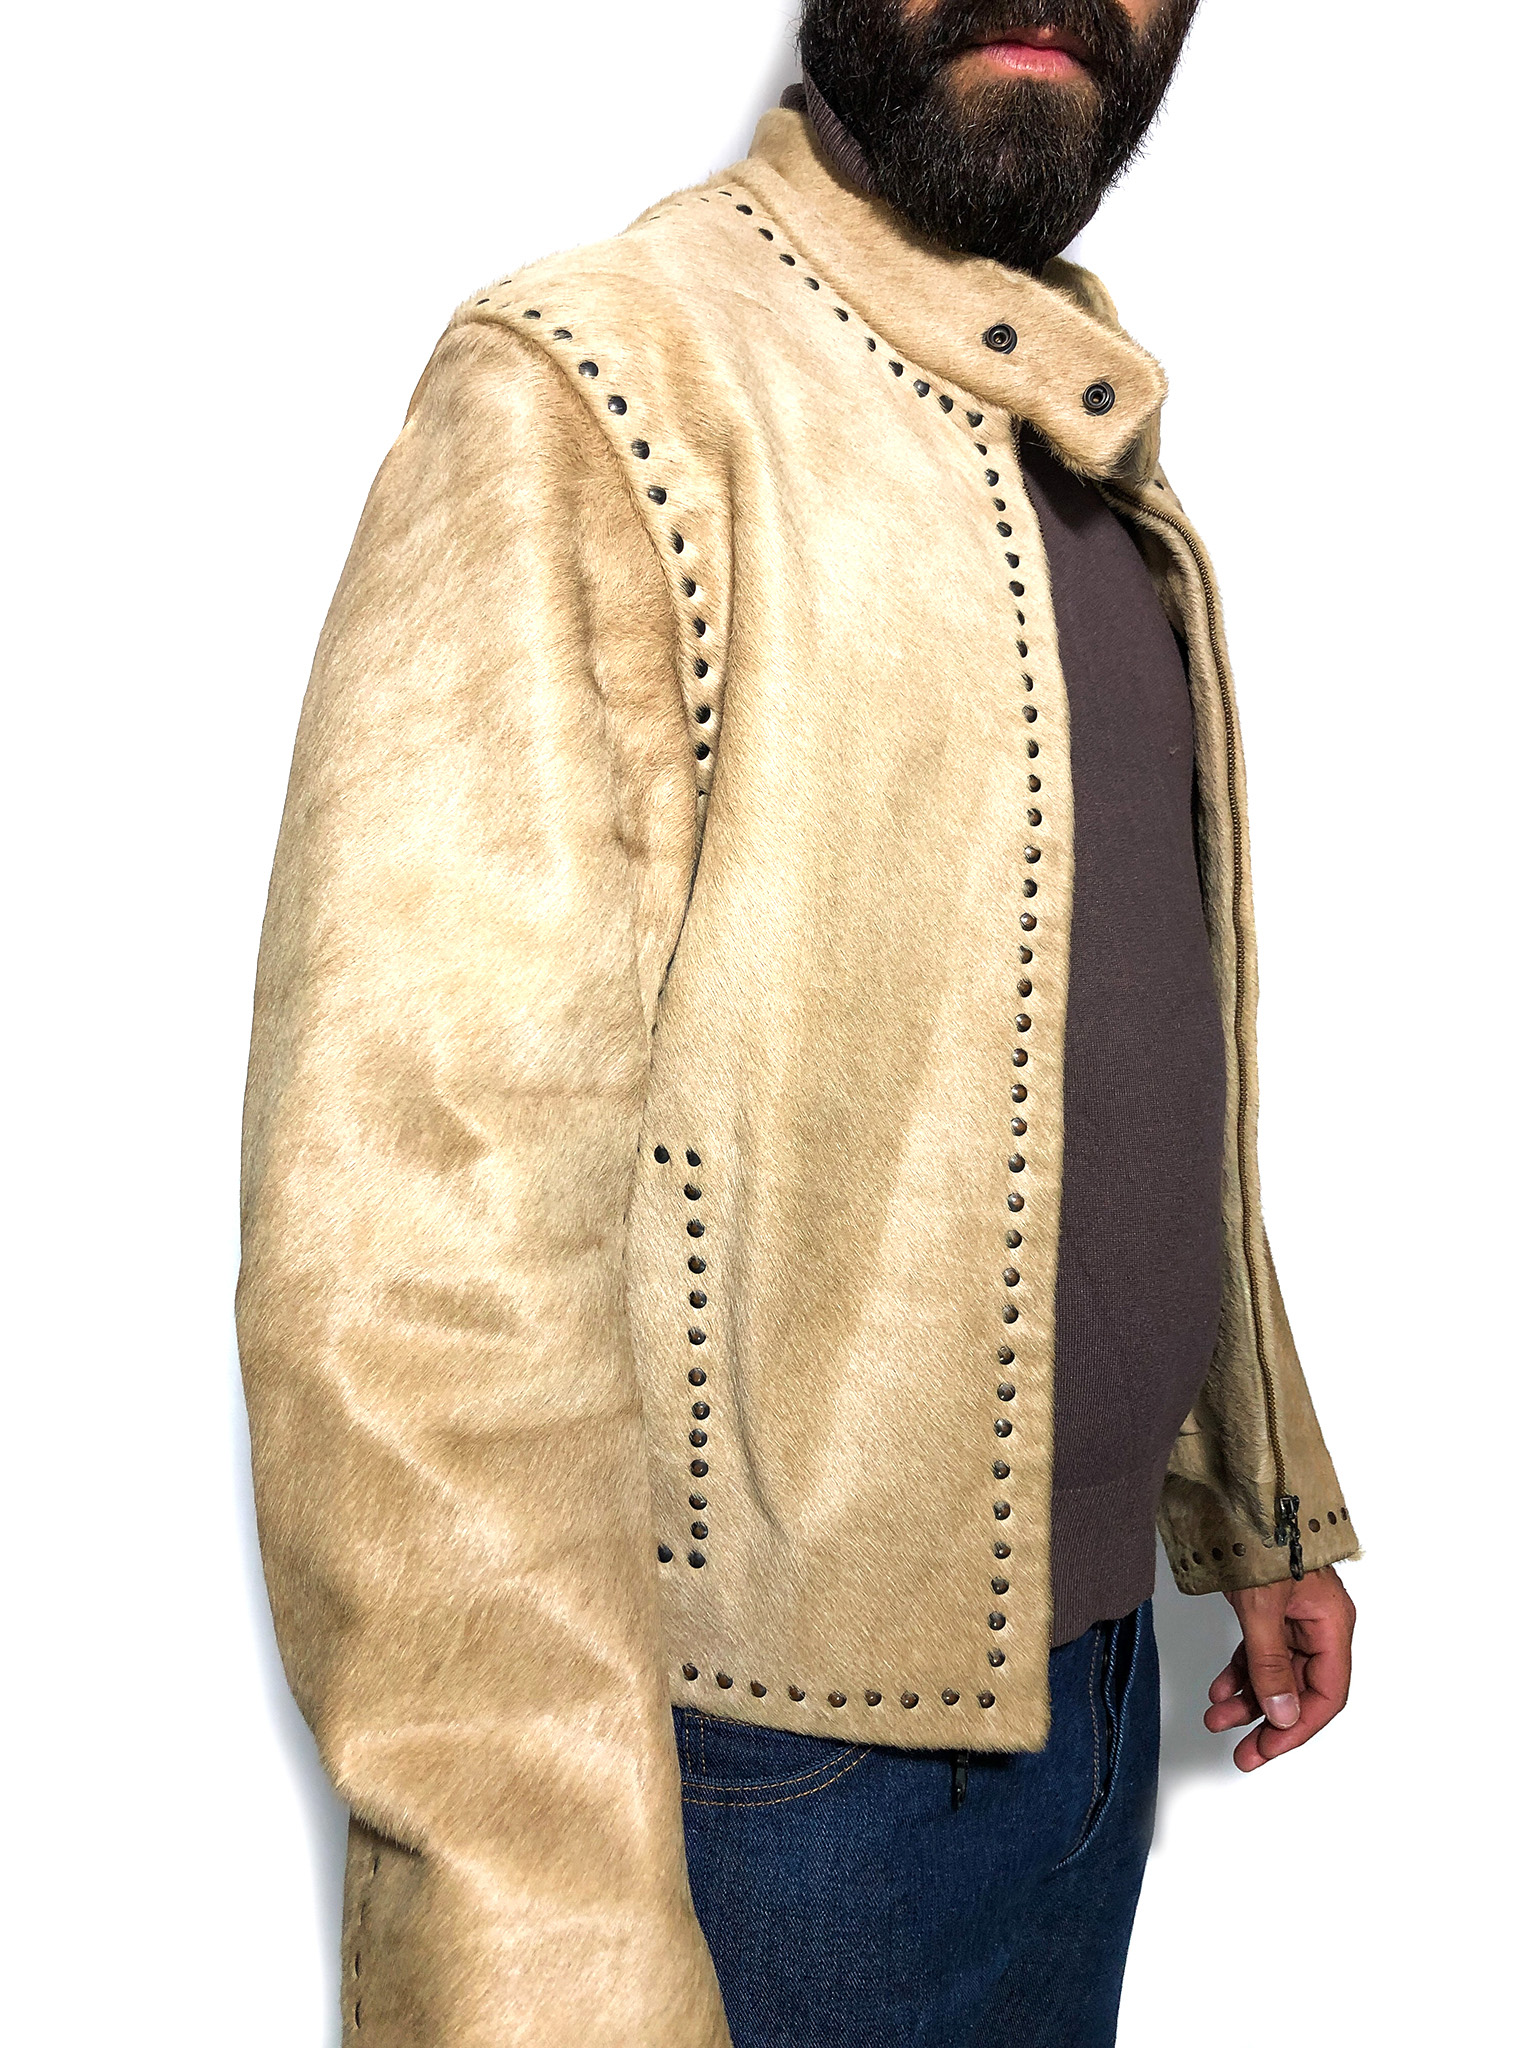 Riveted Jacket